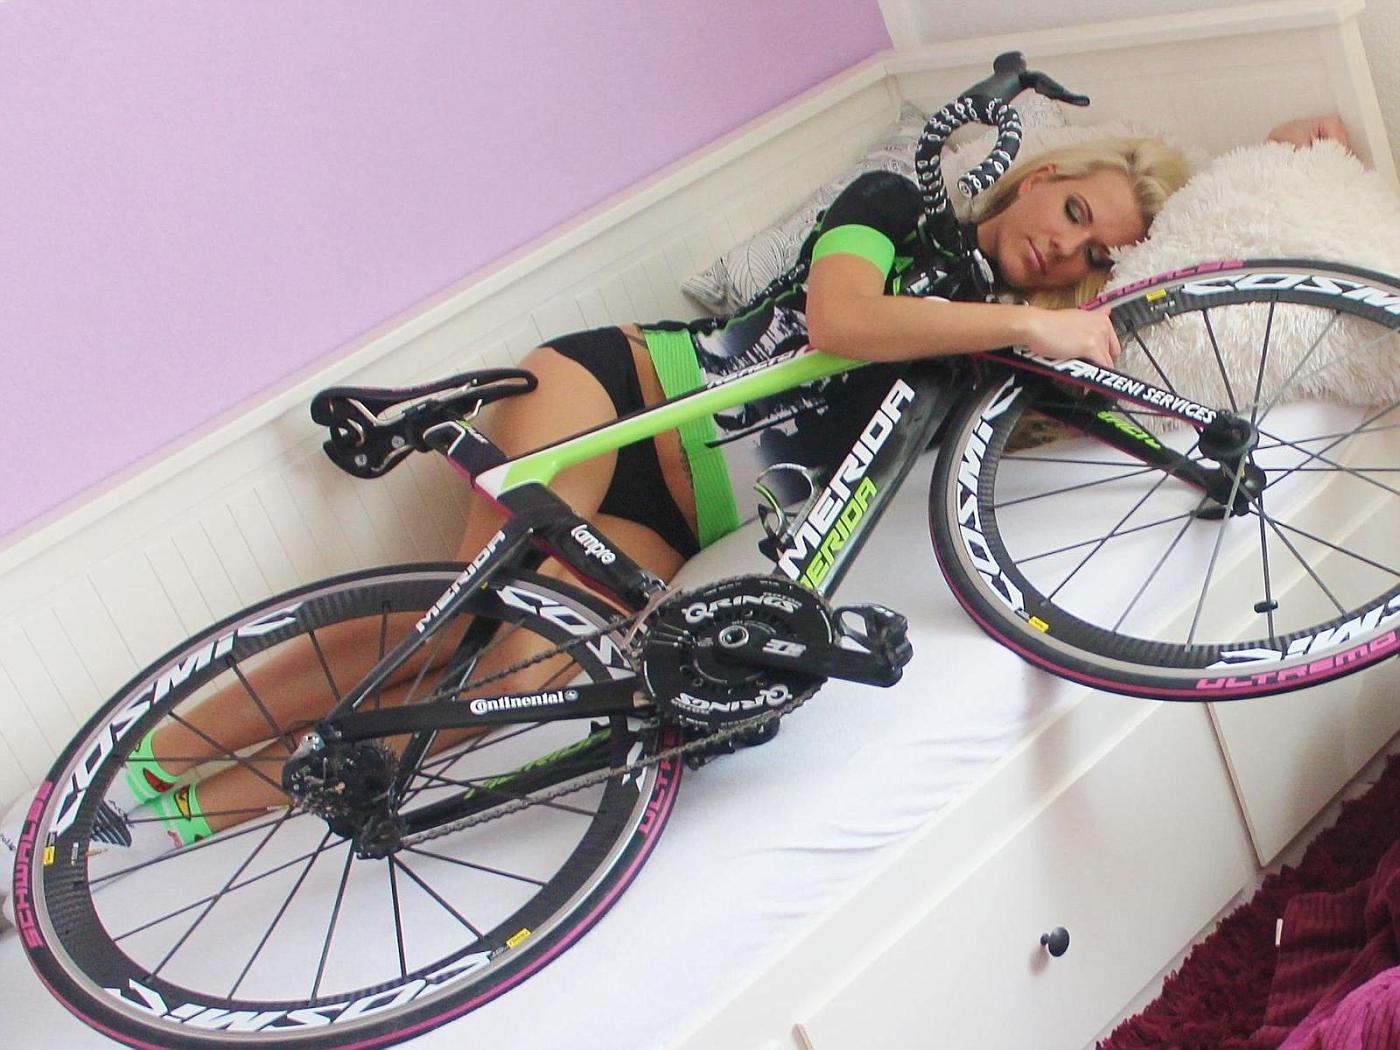 MERIDA - more than a bike